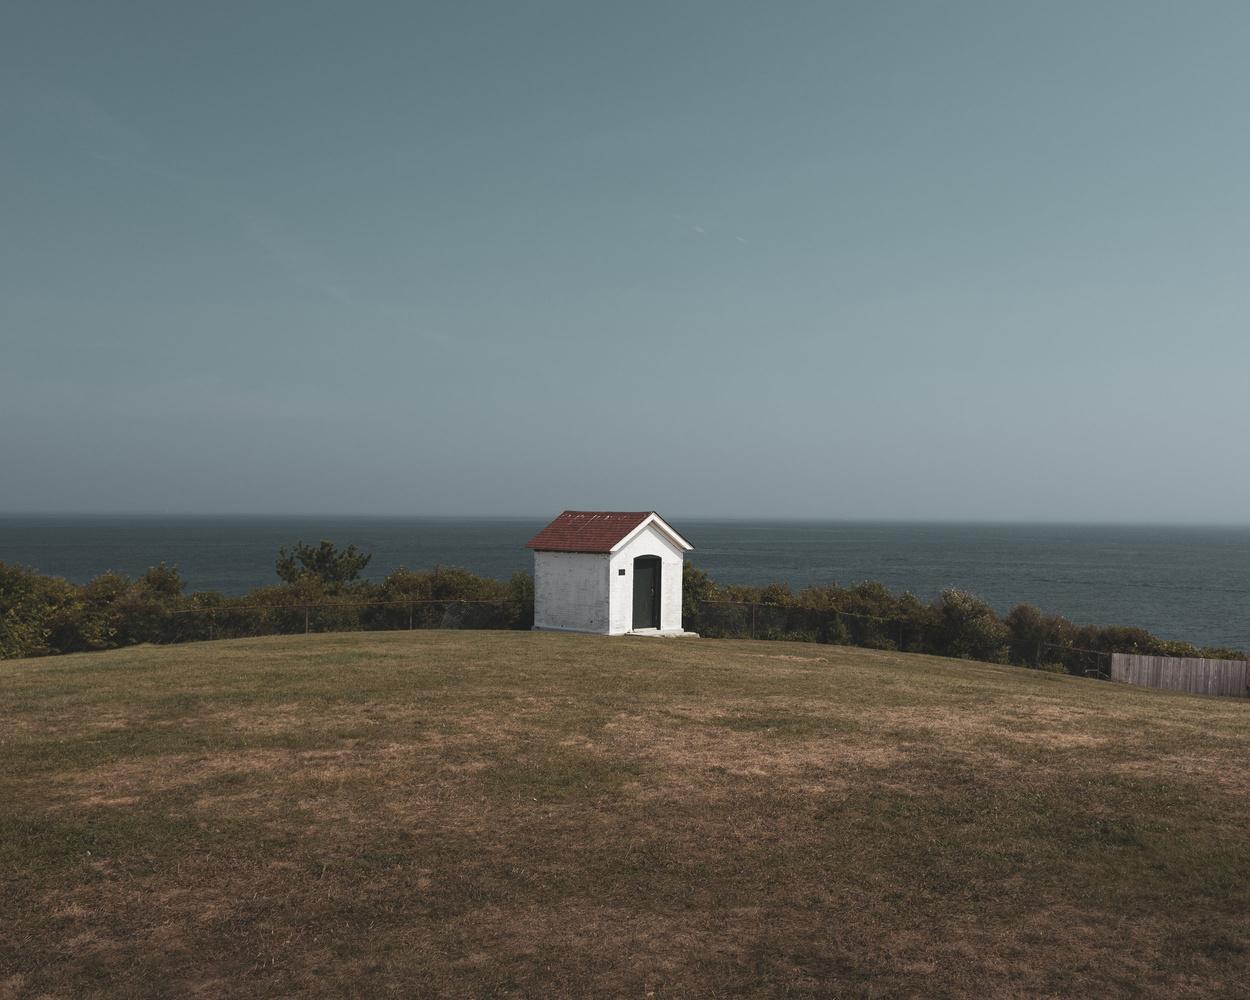 Montauk Shack by Ryan Kerr